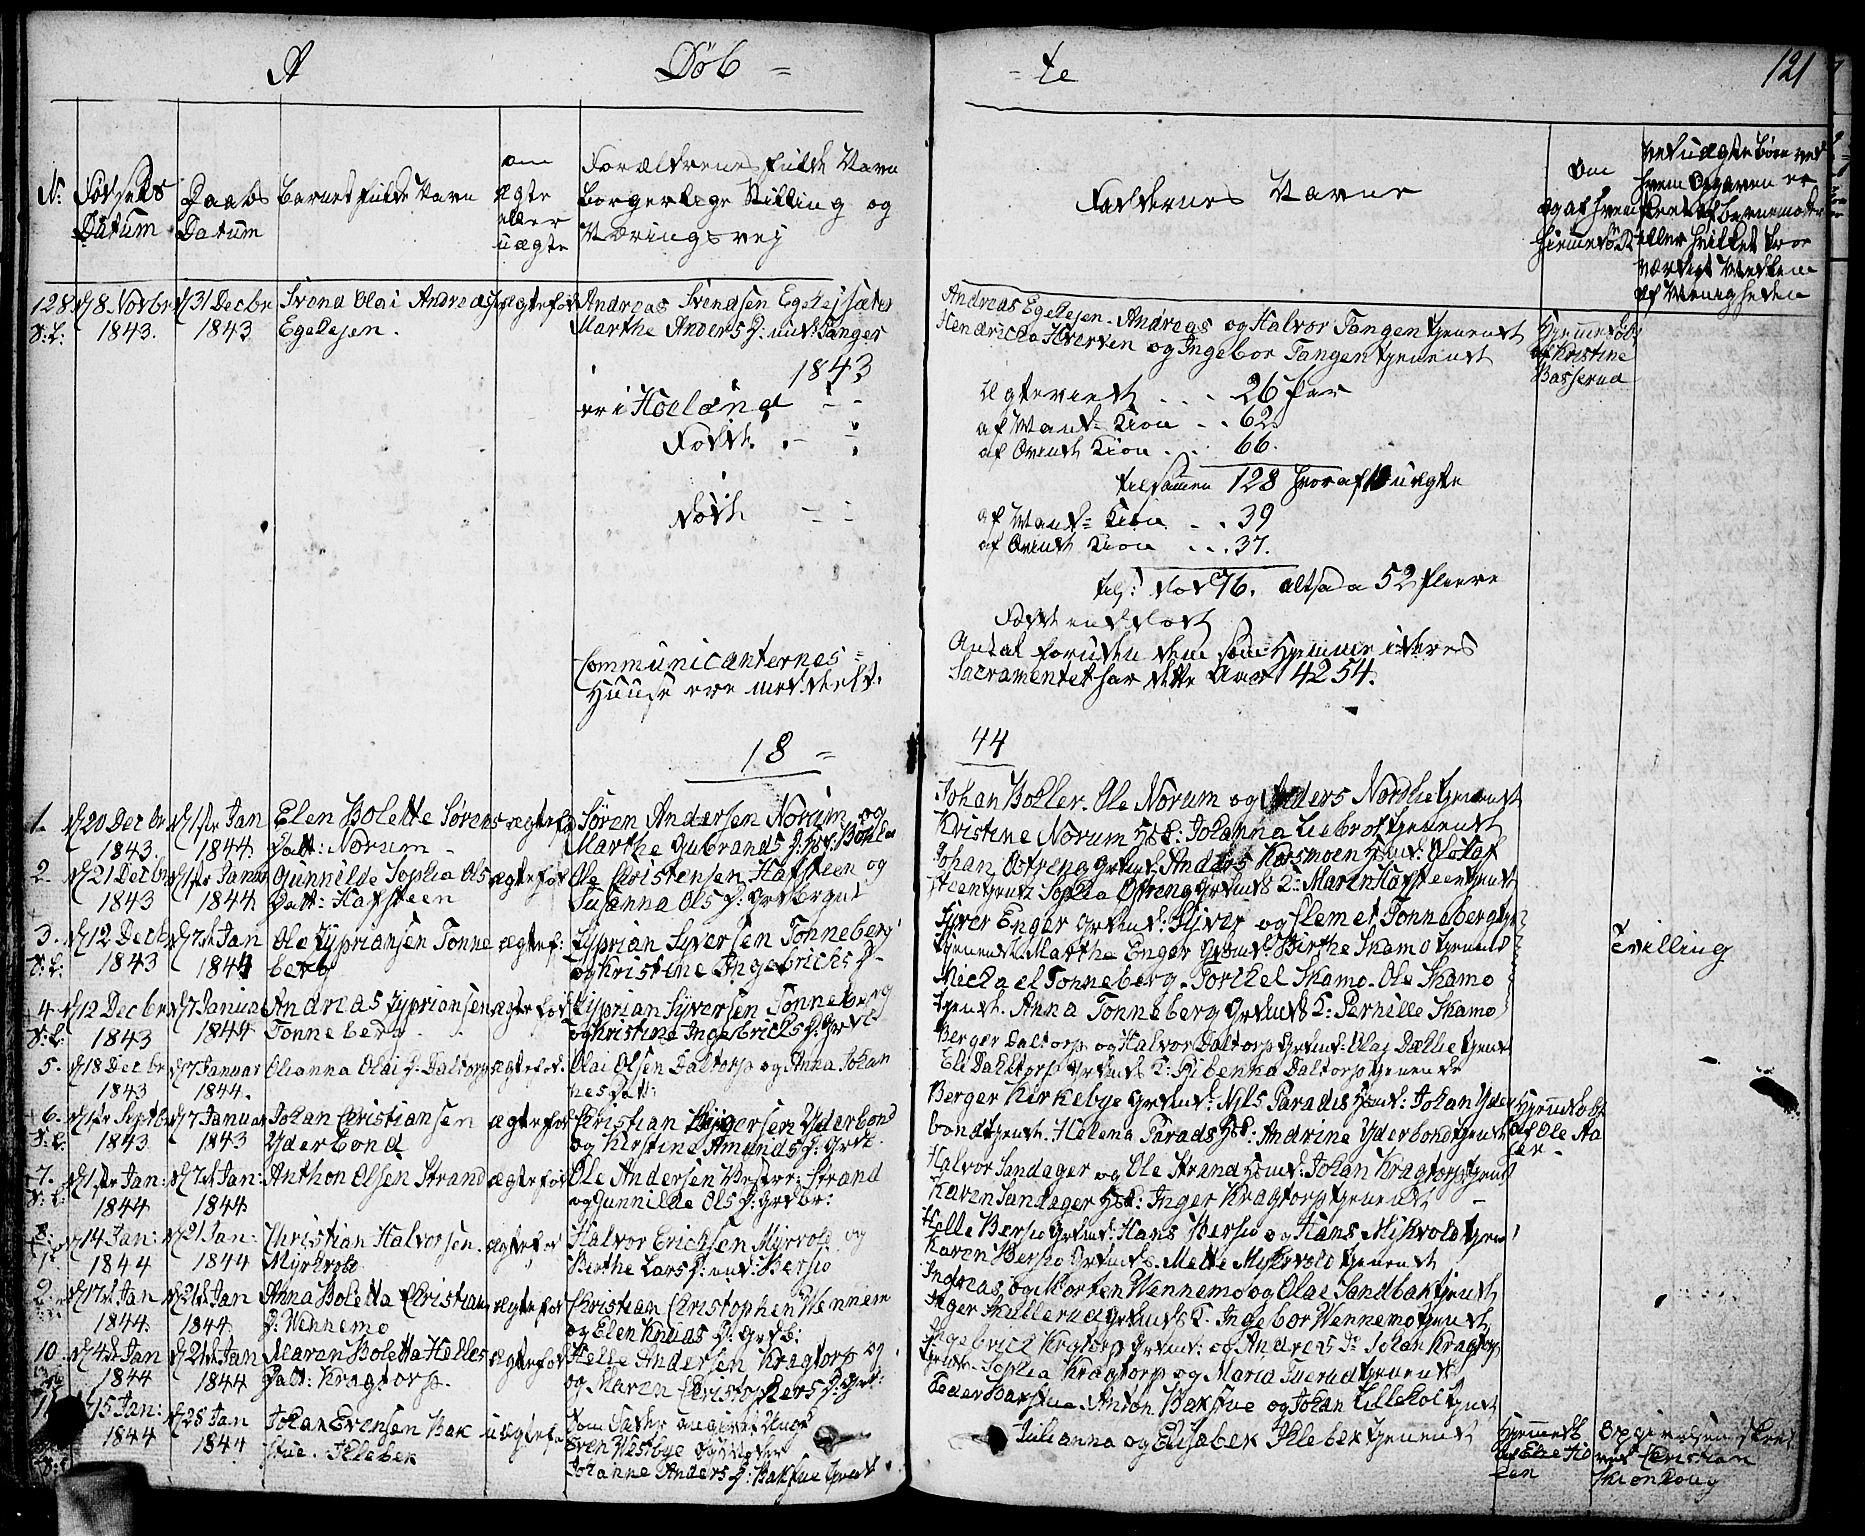 SAO, Høland prestekontor Kirkebøker, F/Fa/L0008: Ministerialbok nr. I 8, 1827-1845, s. 121